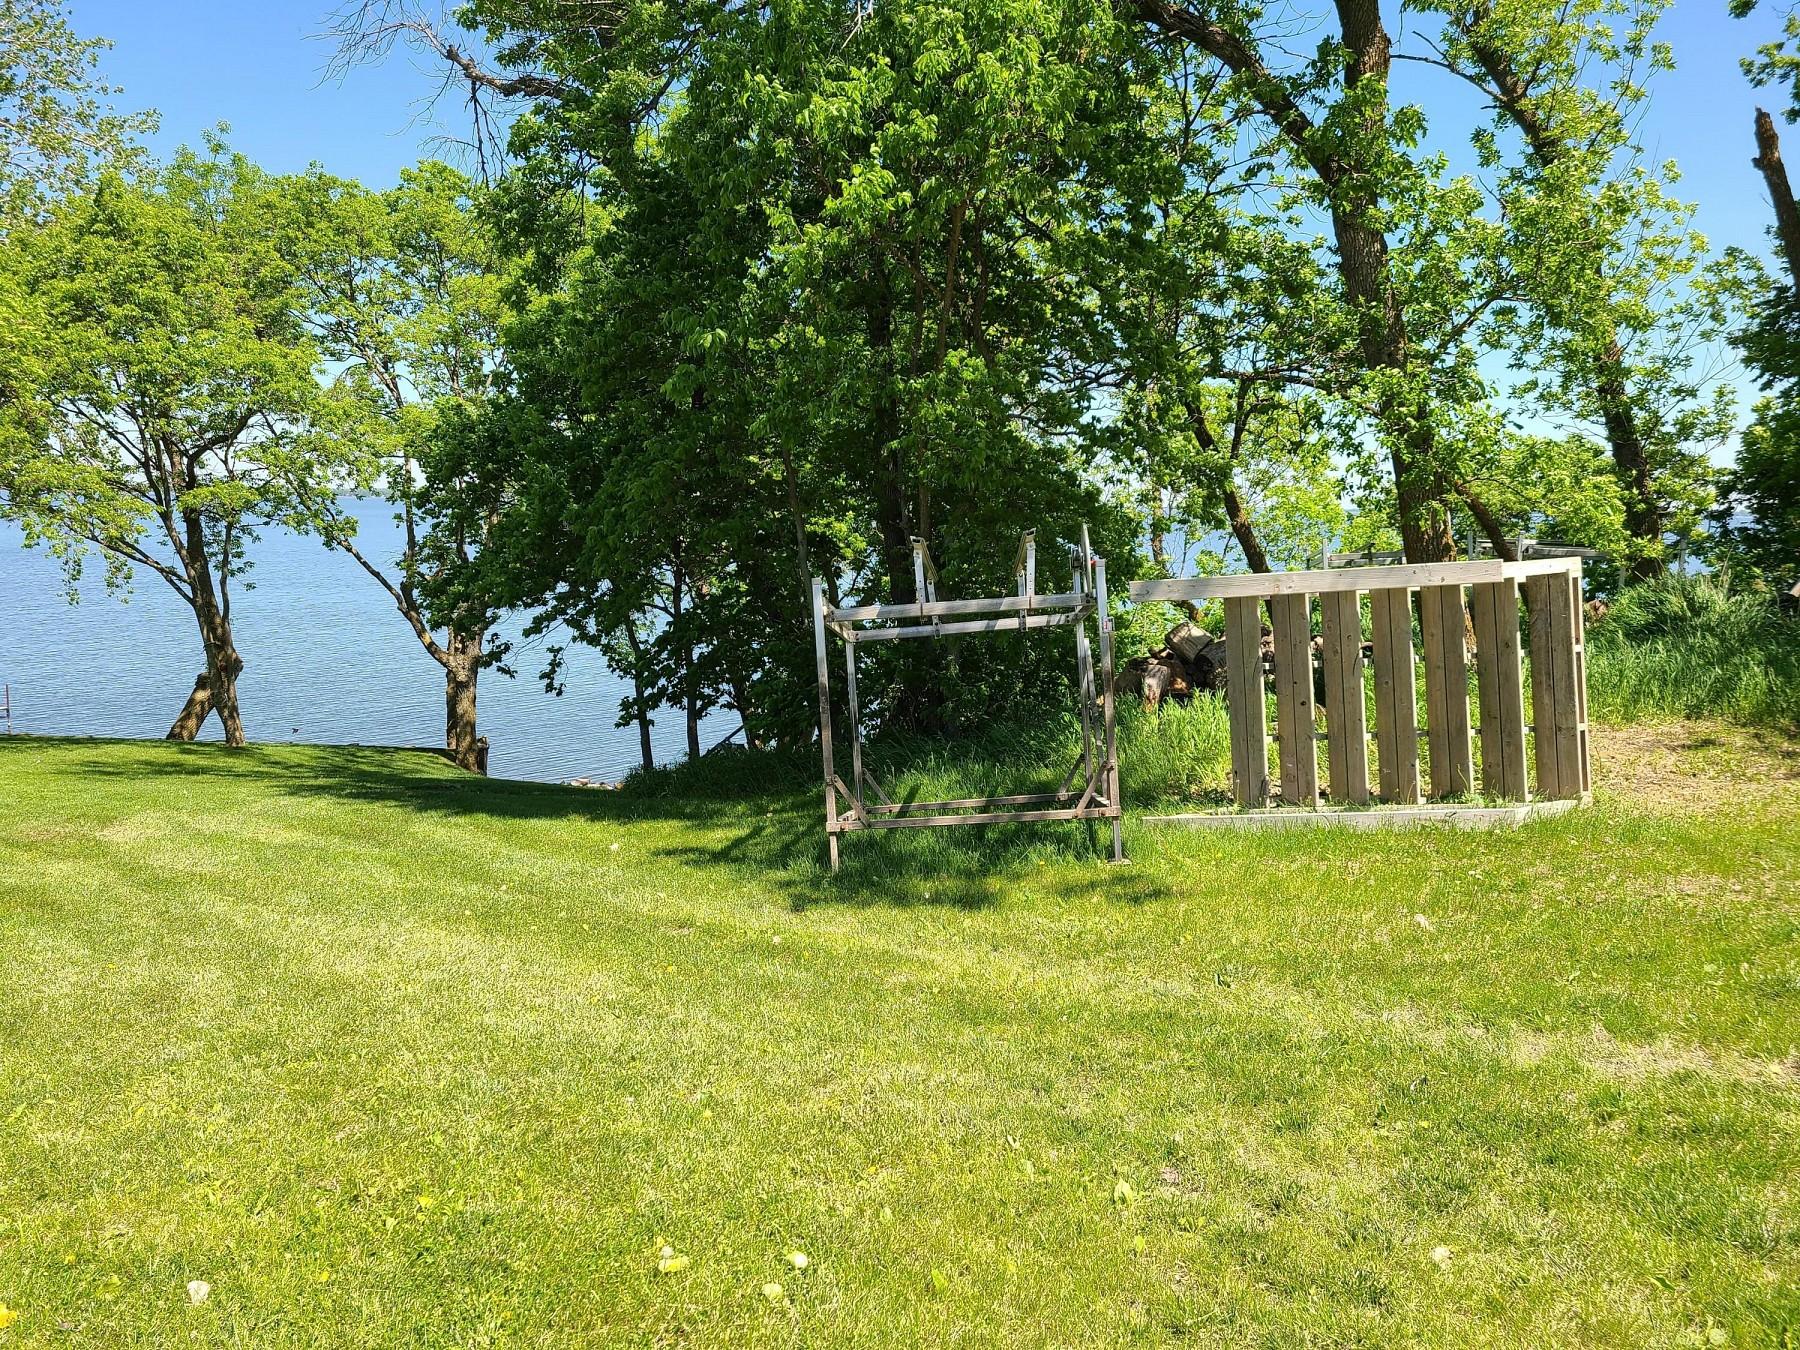 174 South, Lake Poinsett, SD 57006